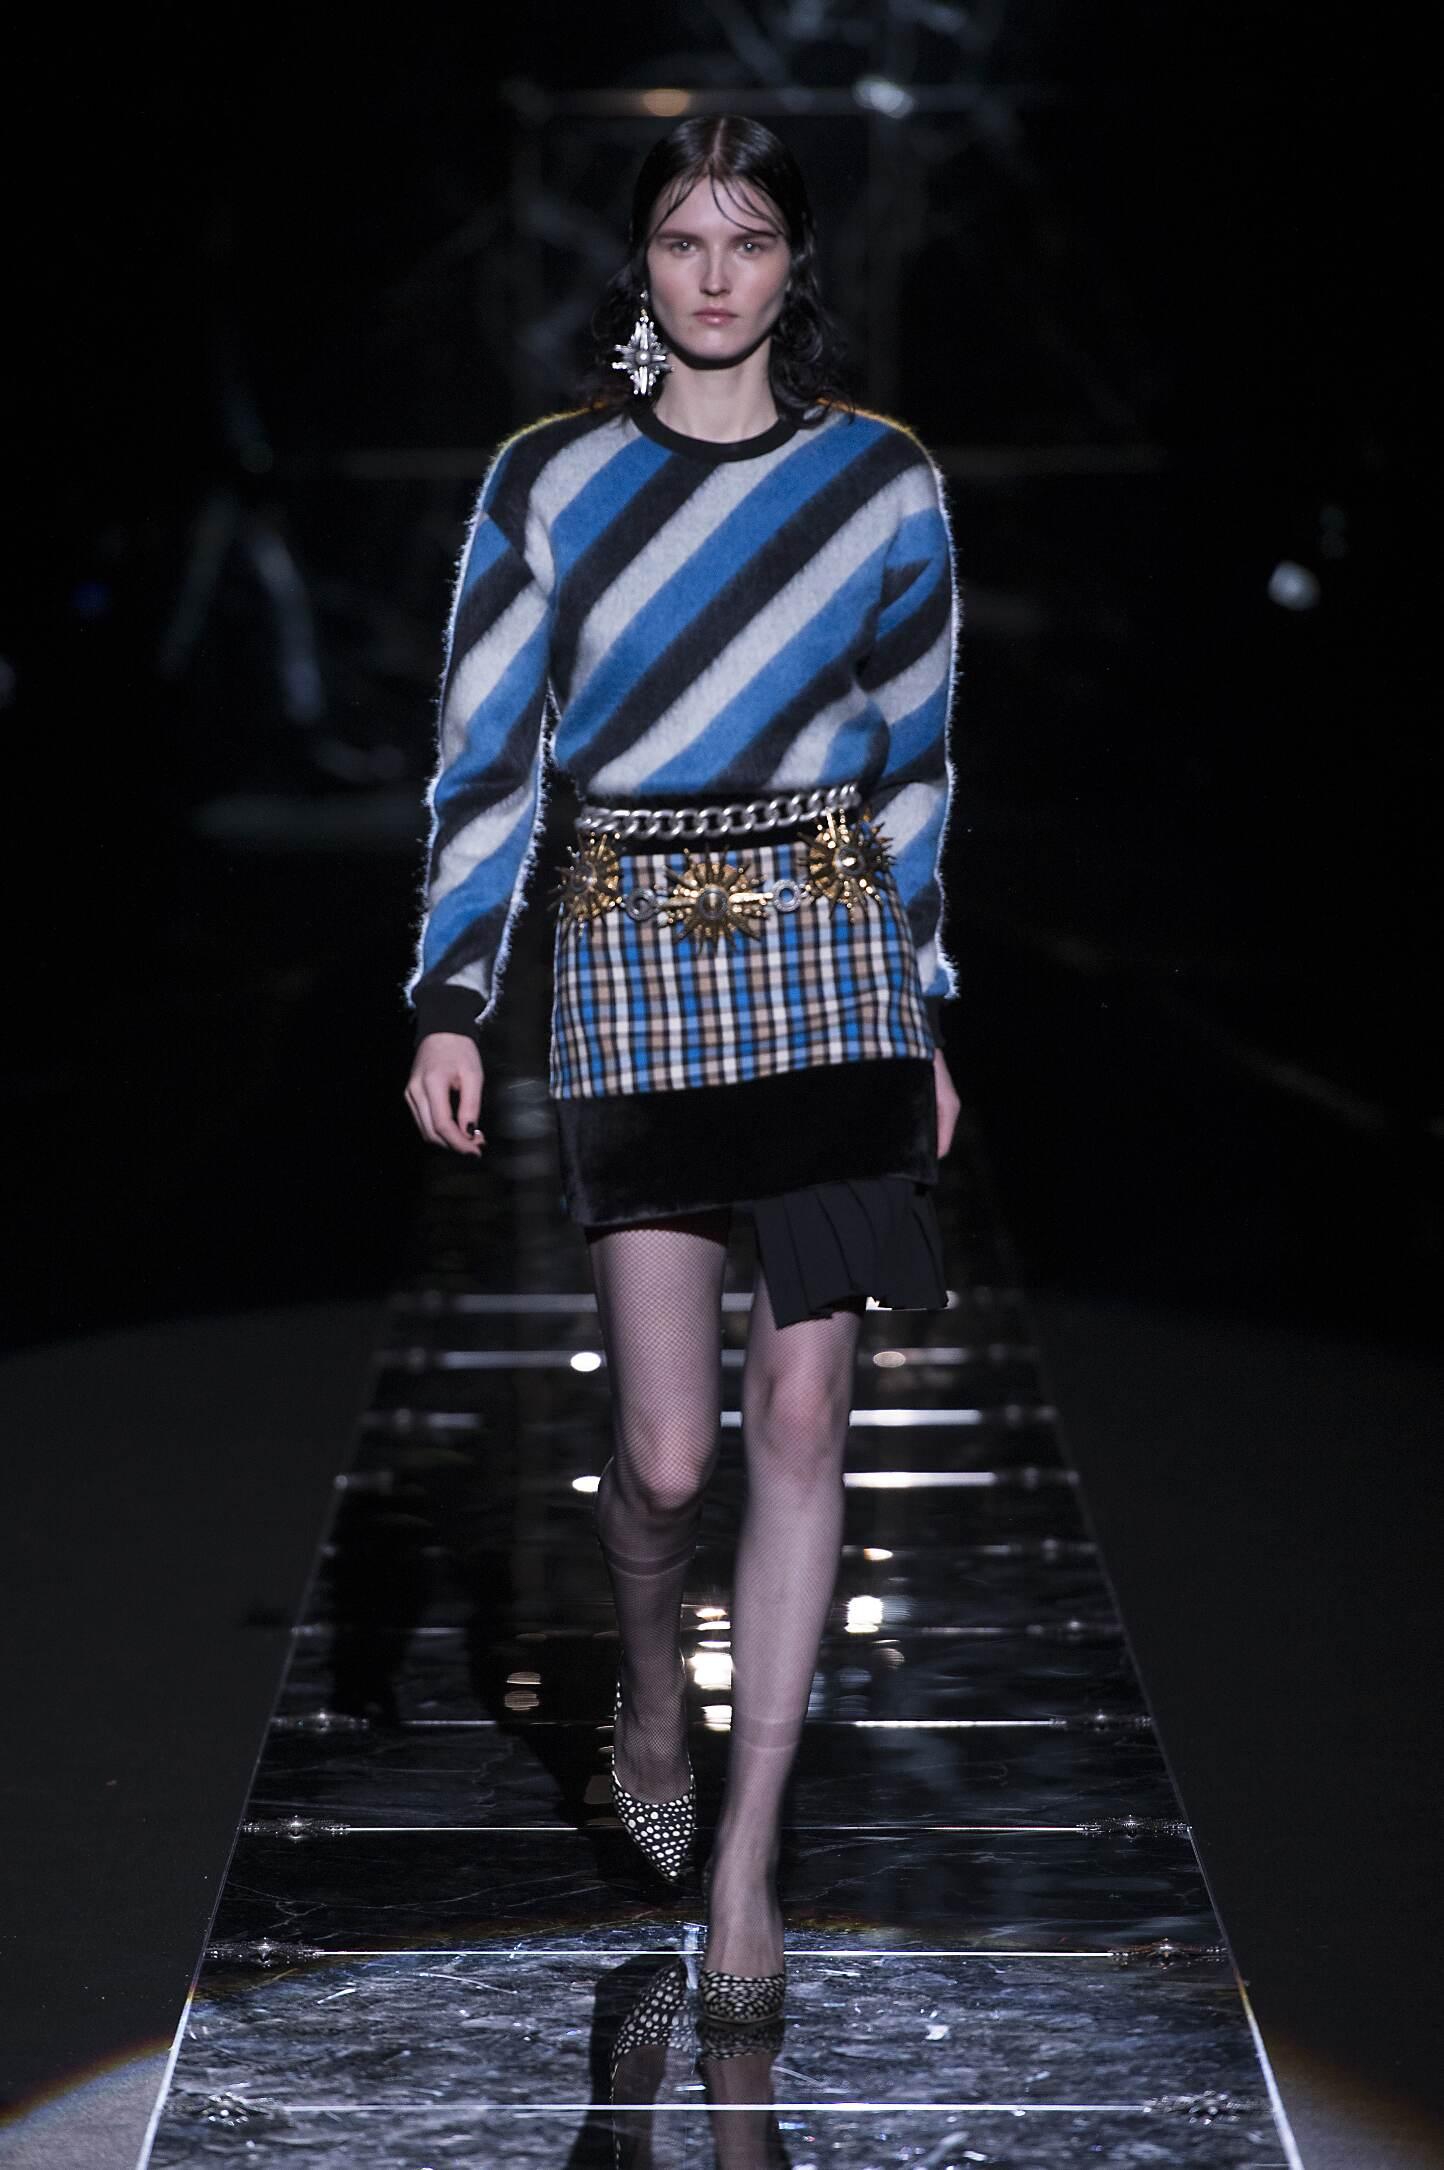 Winter Fashion Trends 2015 2016 Fausto Puglisi Collection